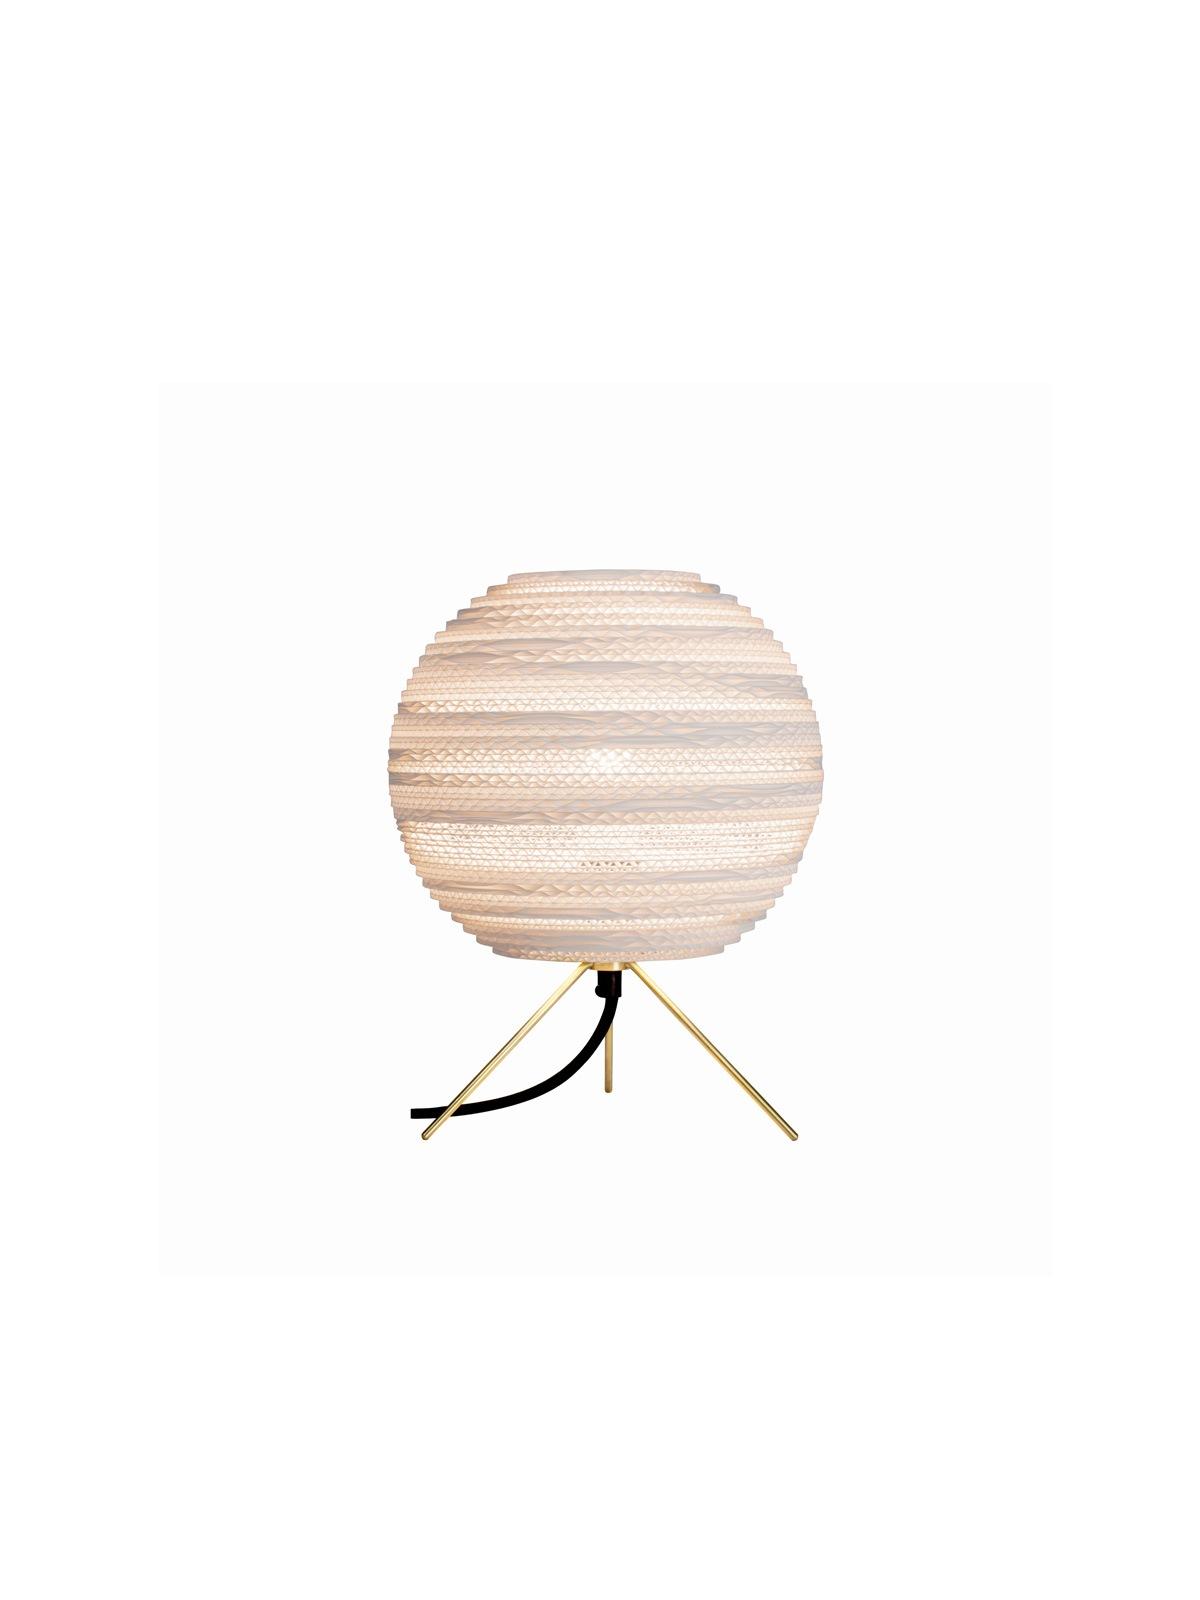 Moon Table white Tischlampe Graypants Pappe Designort Lampen Berlin